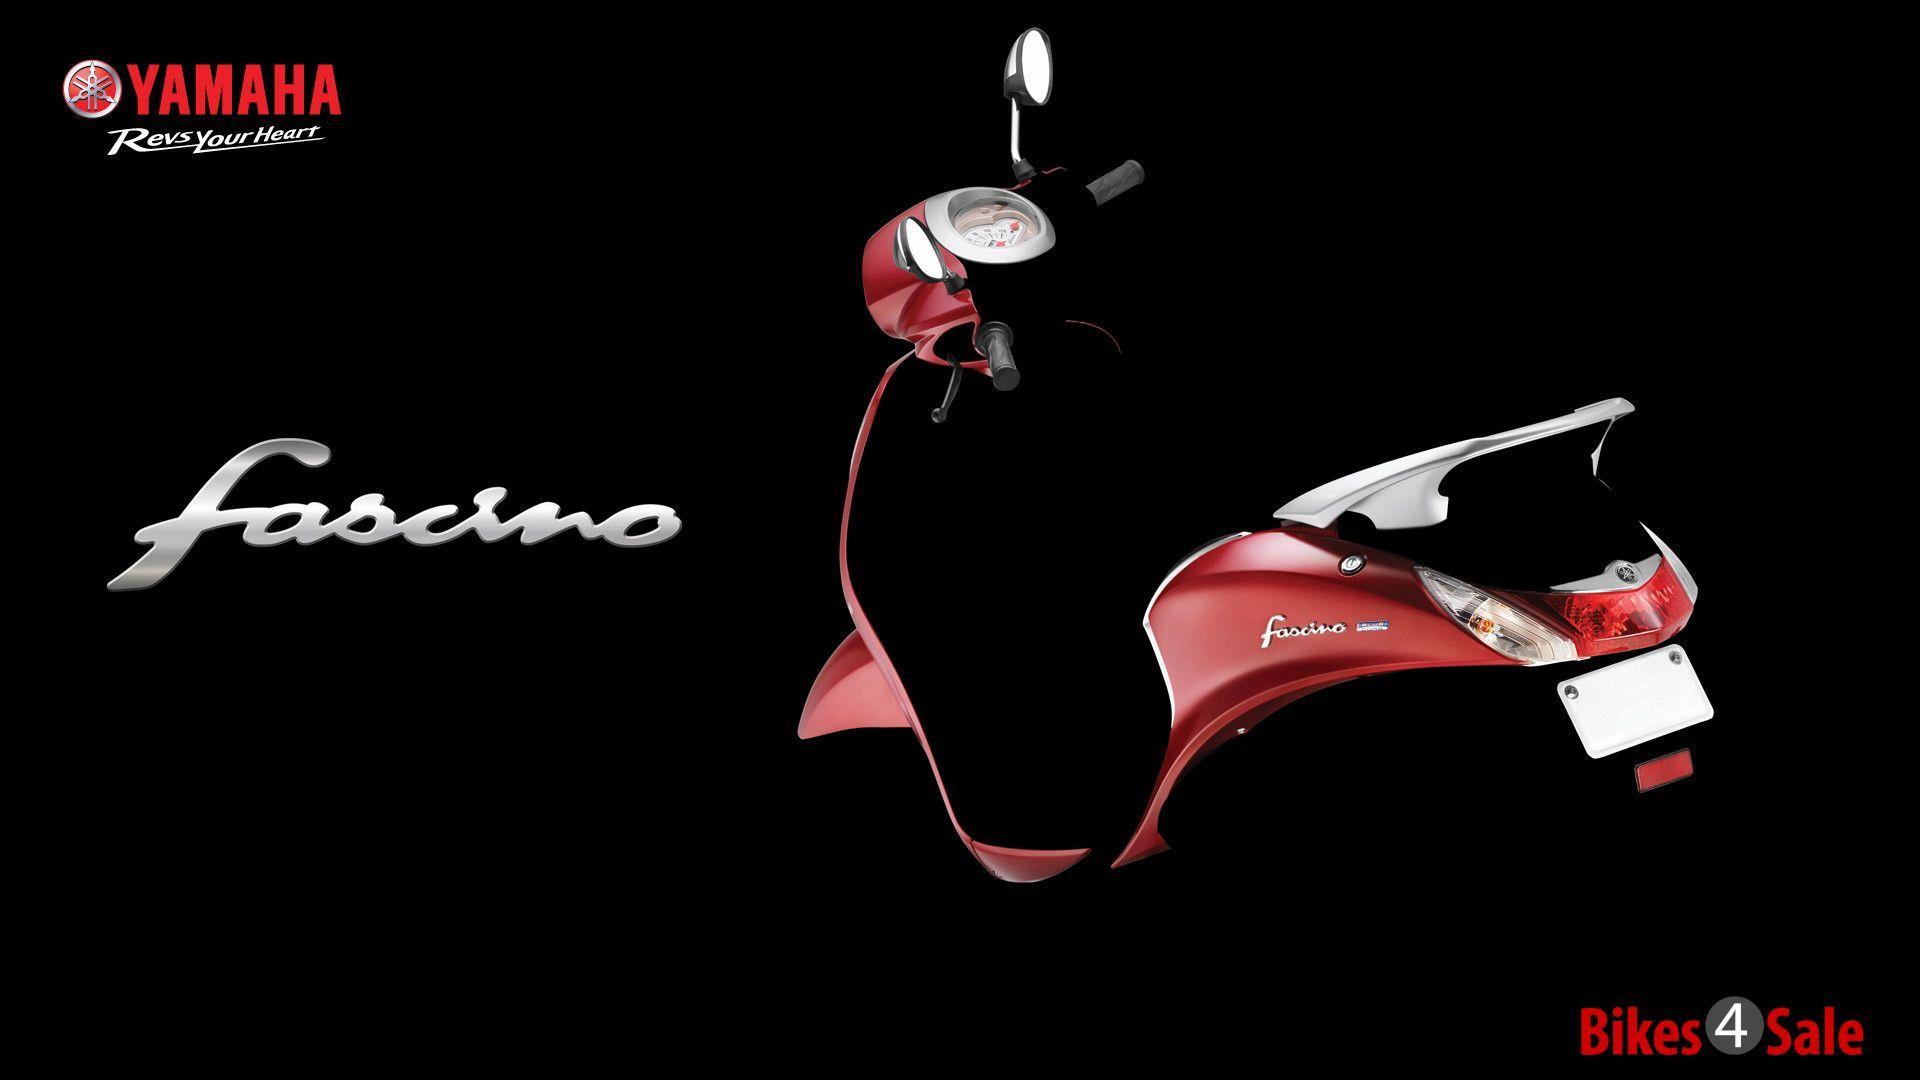 Yamaha Fascino Yamaha Scooter Yamaha Scooter